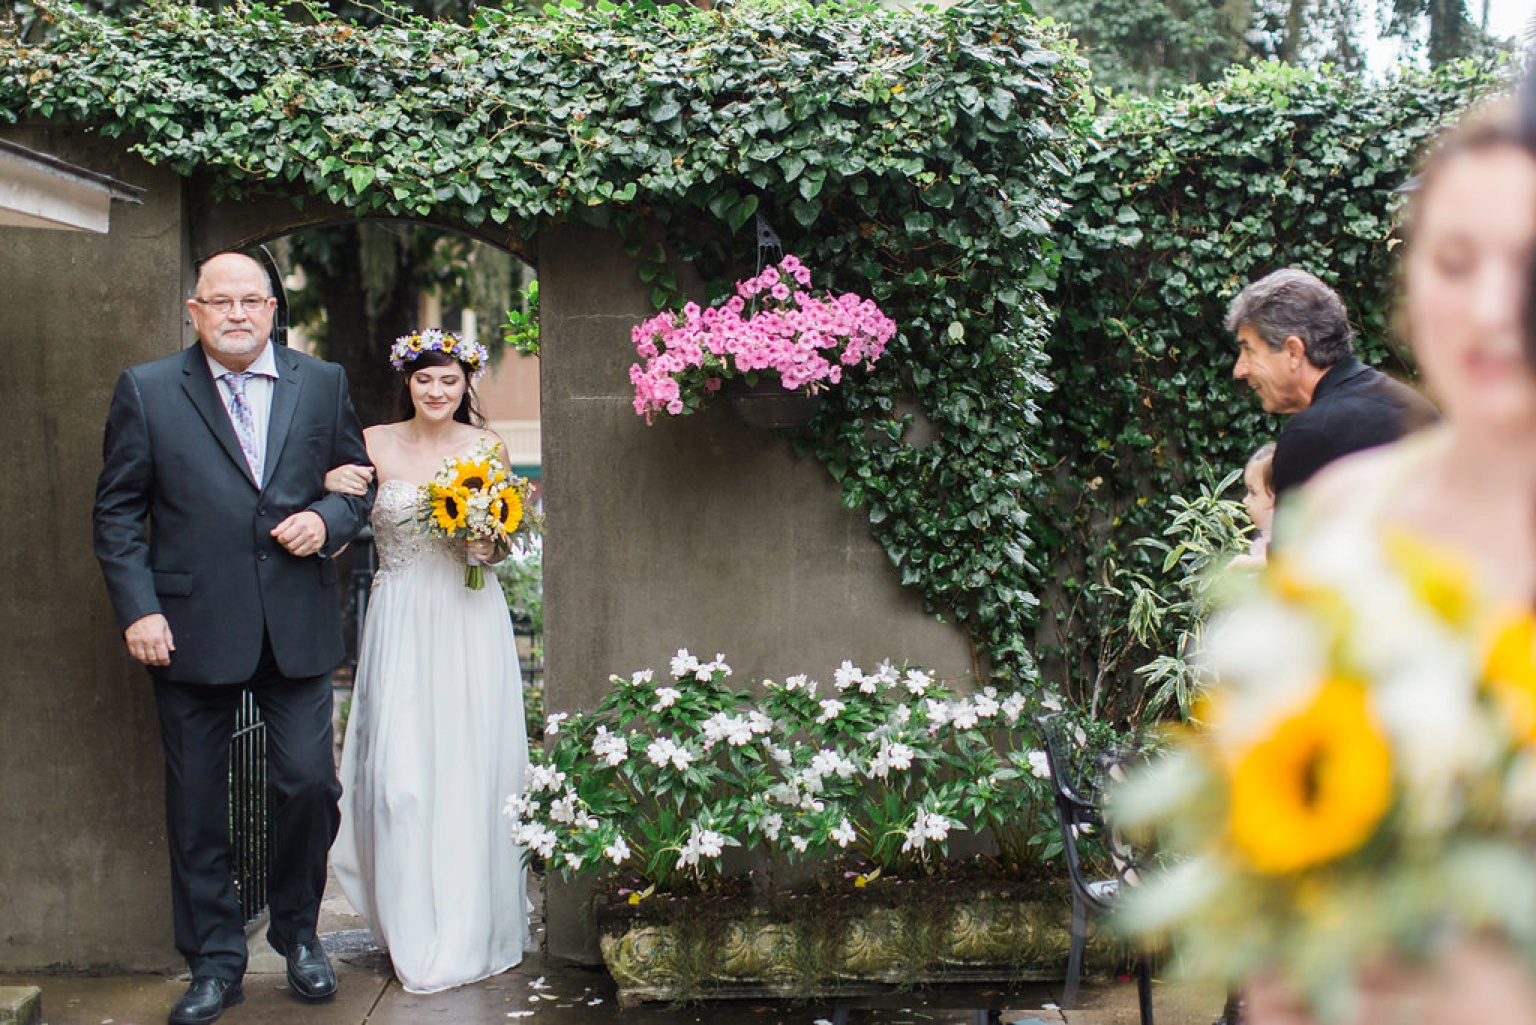 Apt_B_Photo_Savannah_Wedding_Photographer_Flower_Crown024.JPG